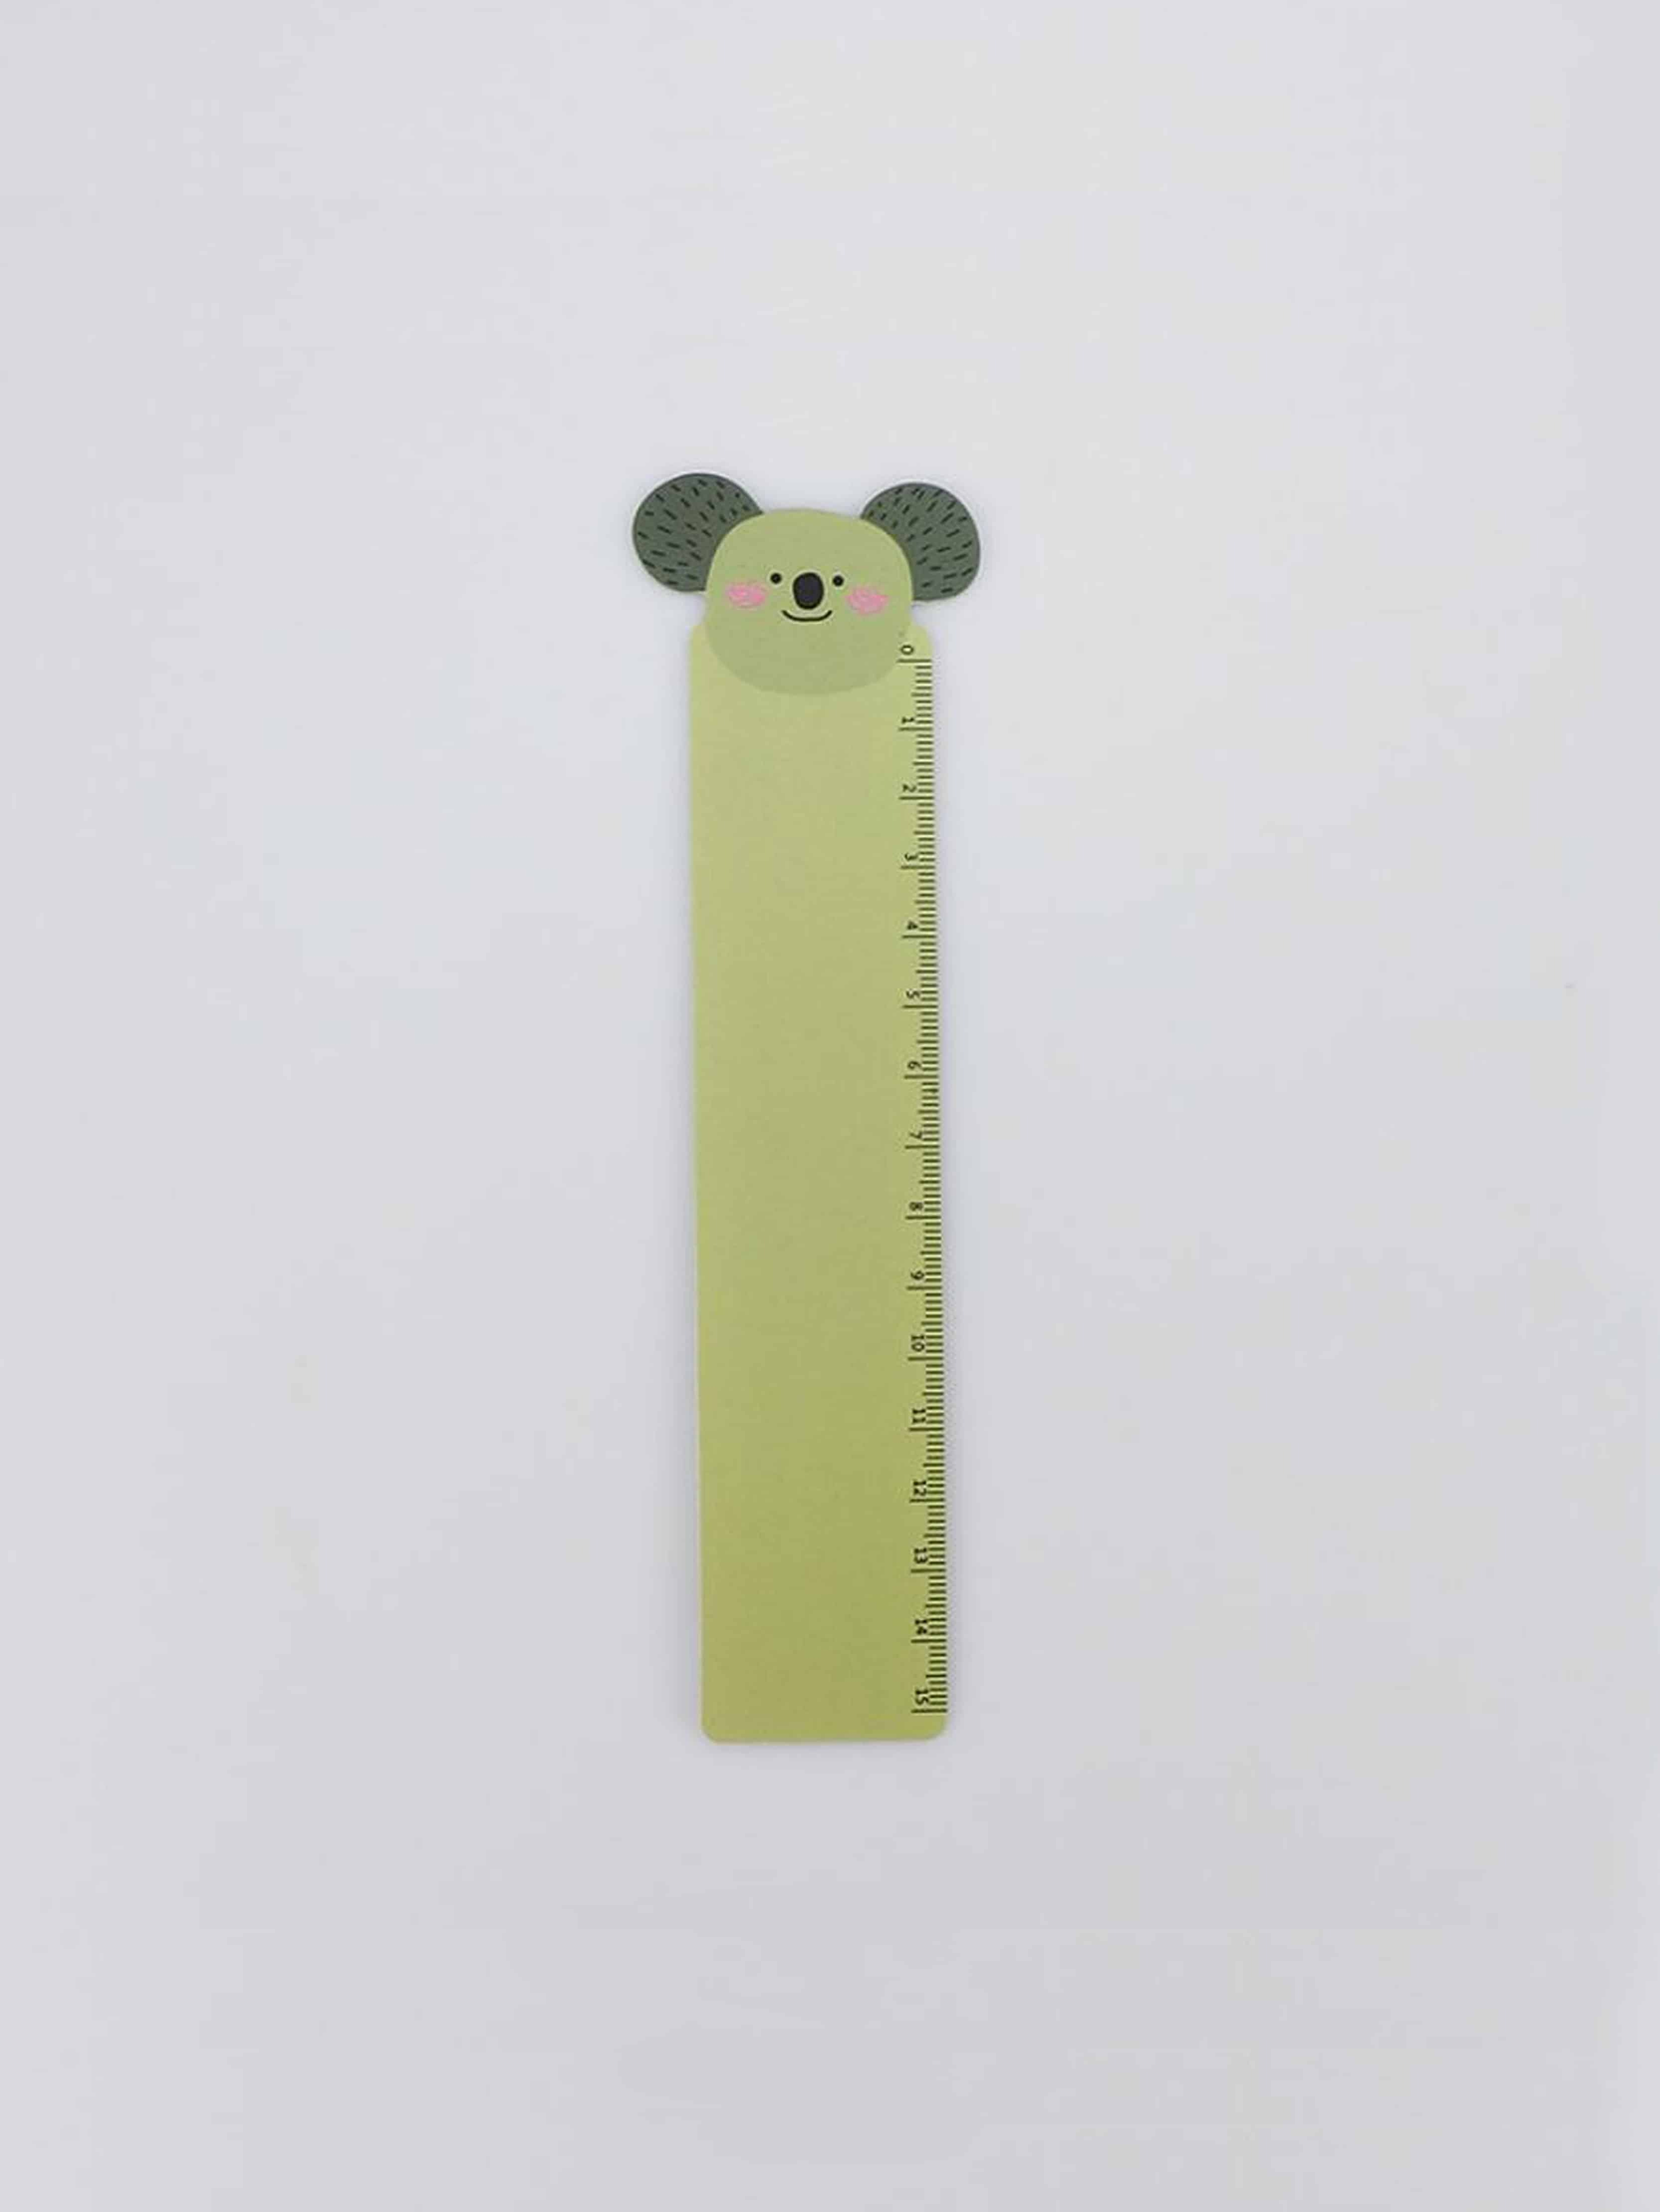 Koala Ruler 15cm аксессуар комплект кабелей rockdale 15cm ic016 15cm